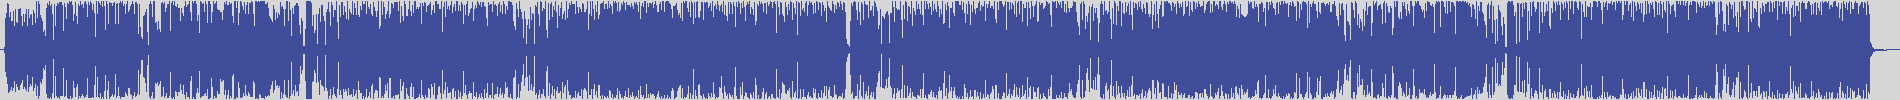 smilax_dig_records [Smilax_X448DIG] Erica - Il Coccodrillo Come Fa [Original Mix] audio wave form